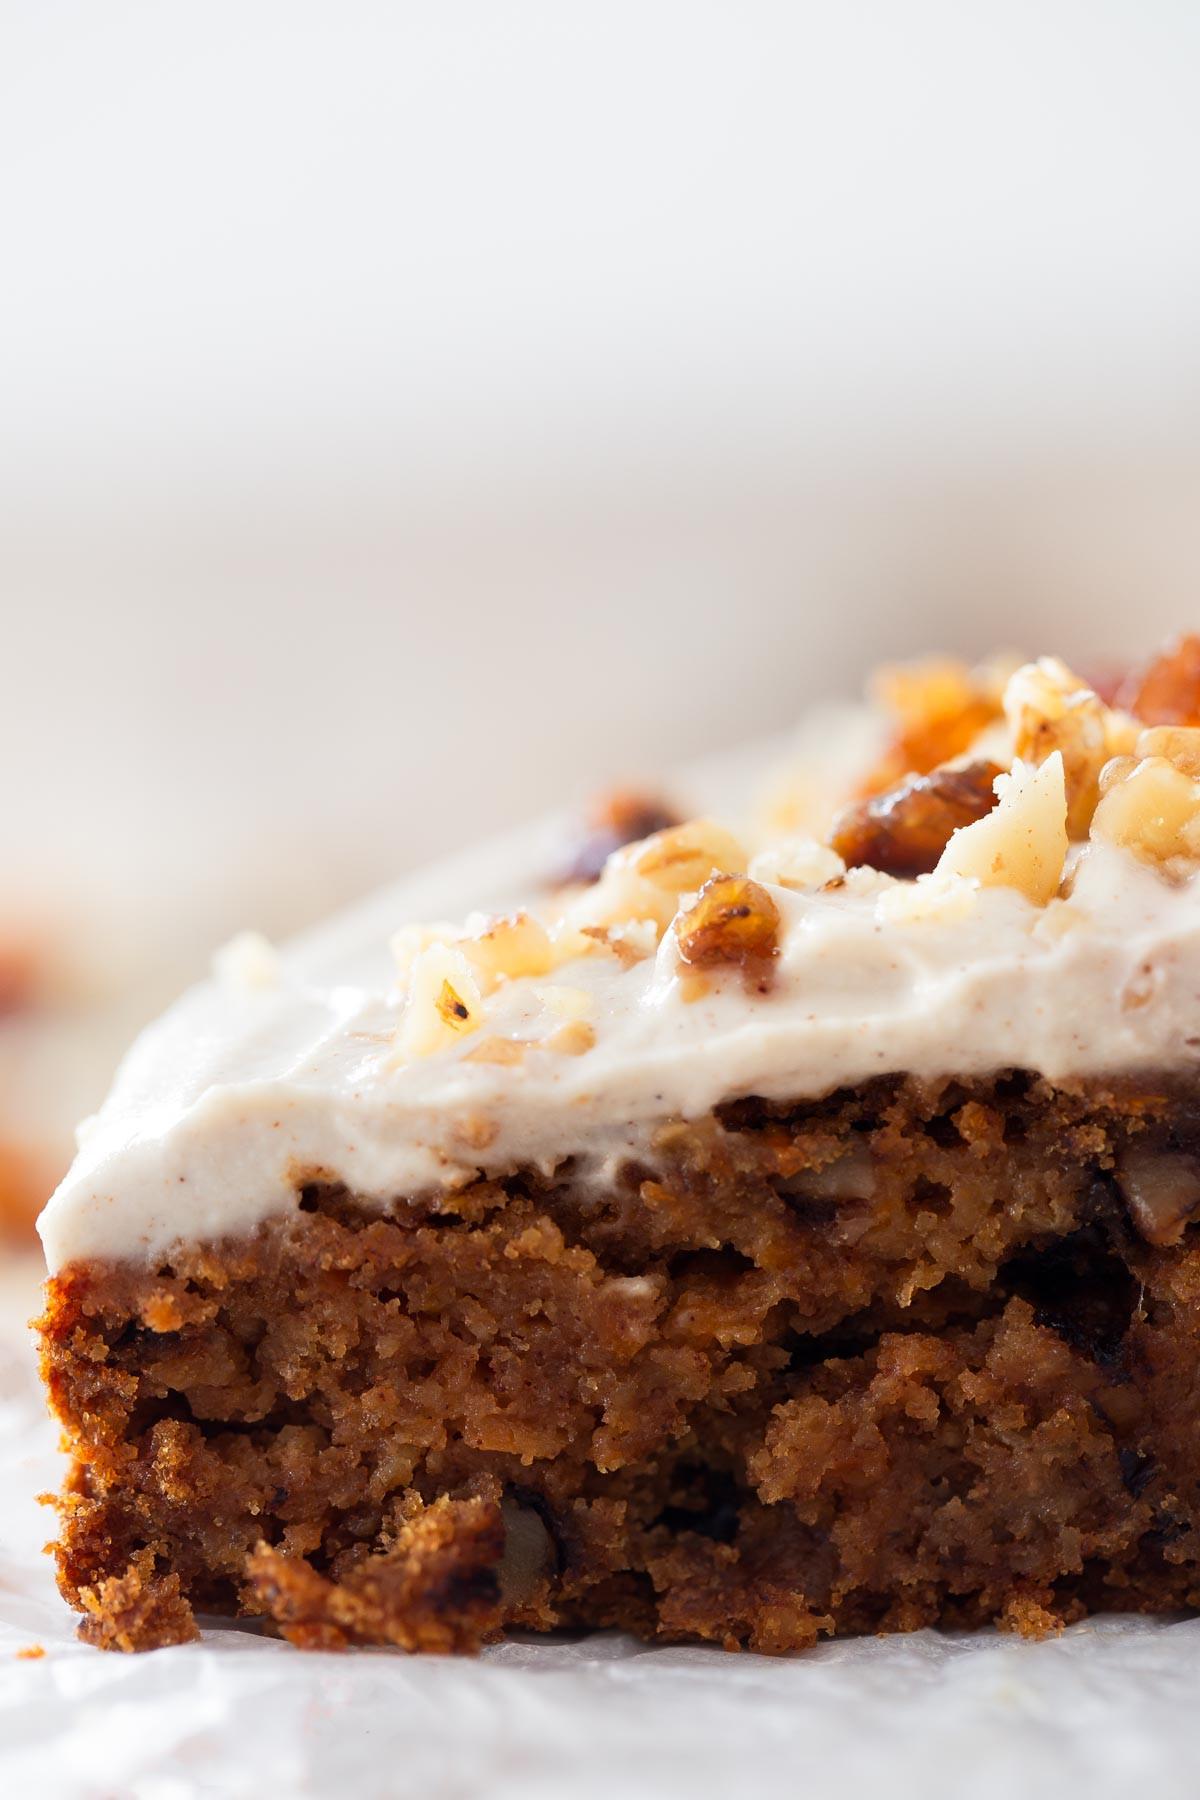 Healthy Vegan Cake Recipes  Vegan Carrot Cake Gluten Free